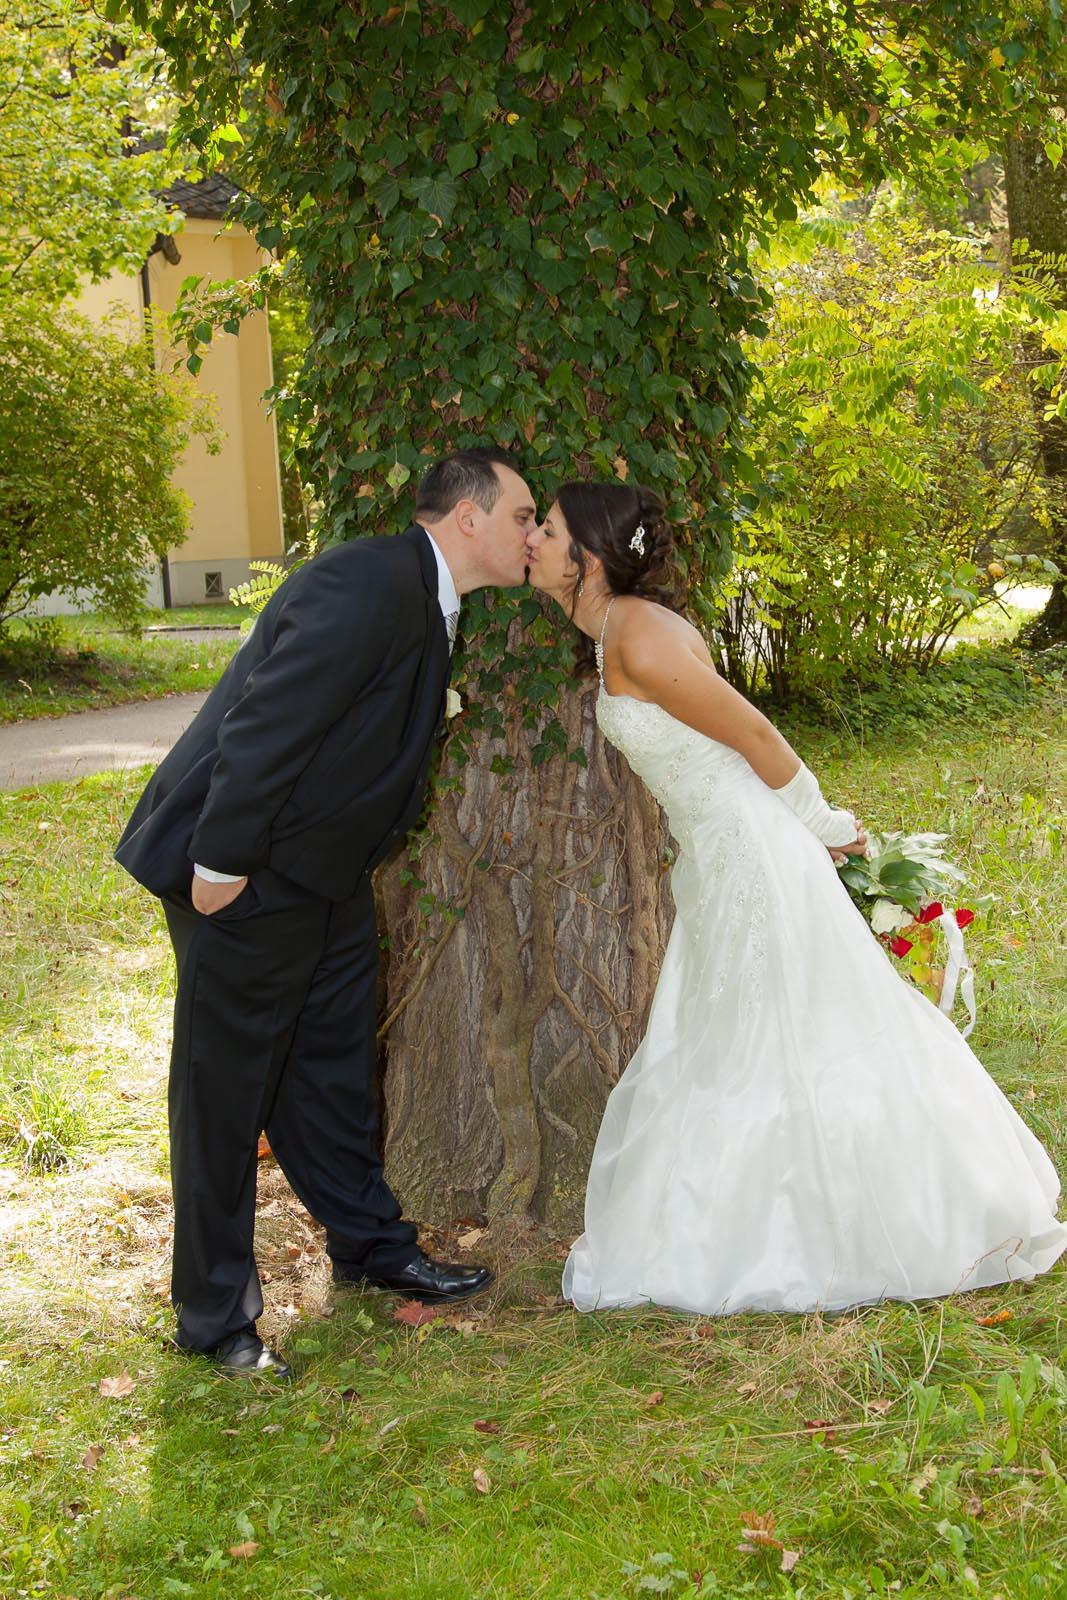 Hochzeit-Portraits-Filoni-Hochzeit-Filoni-8126.jpg